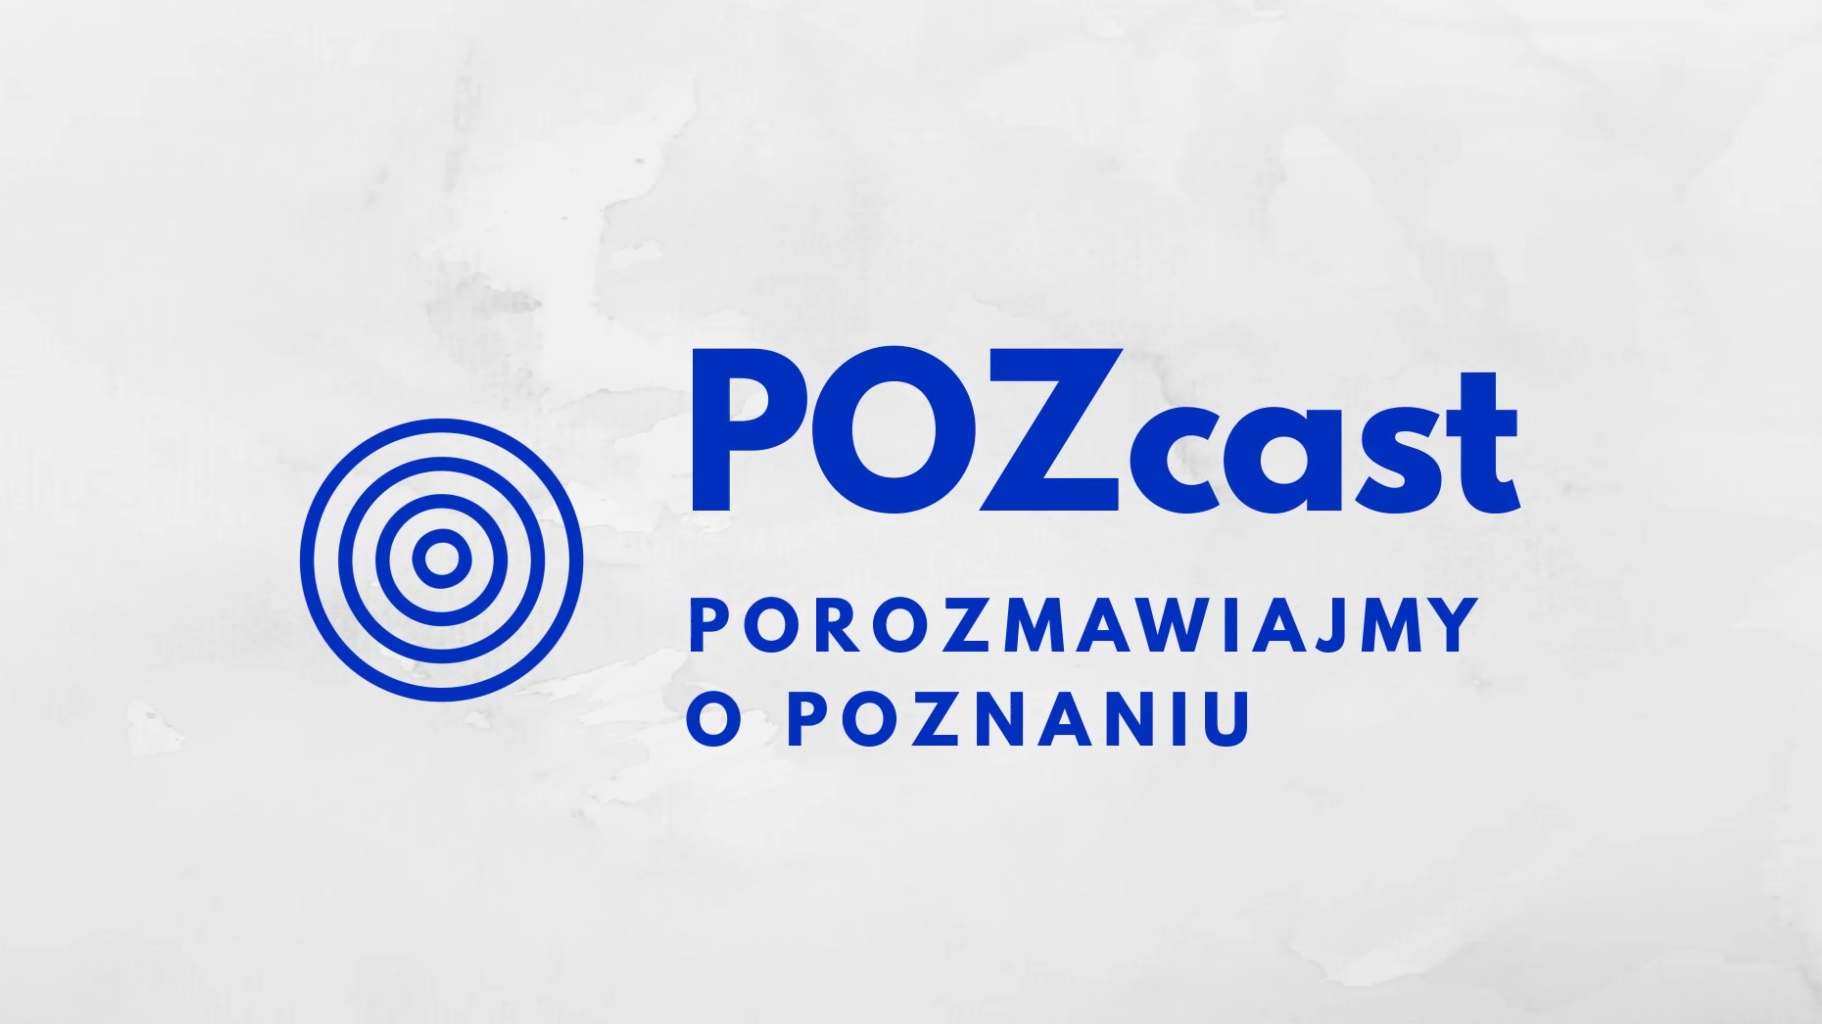 POZcast – let's talk about Poznan